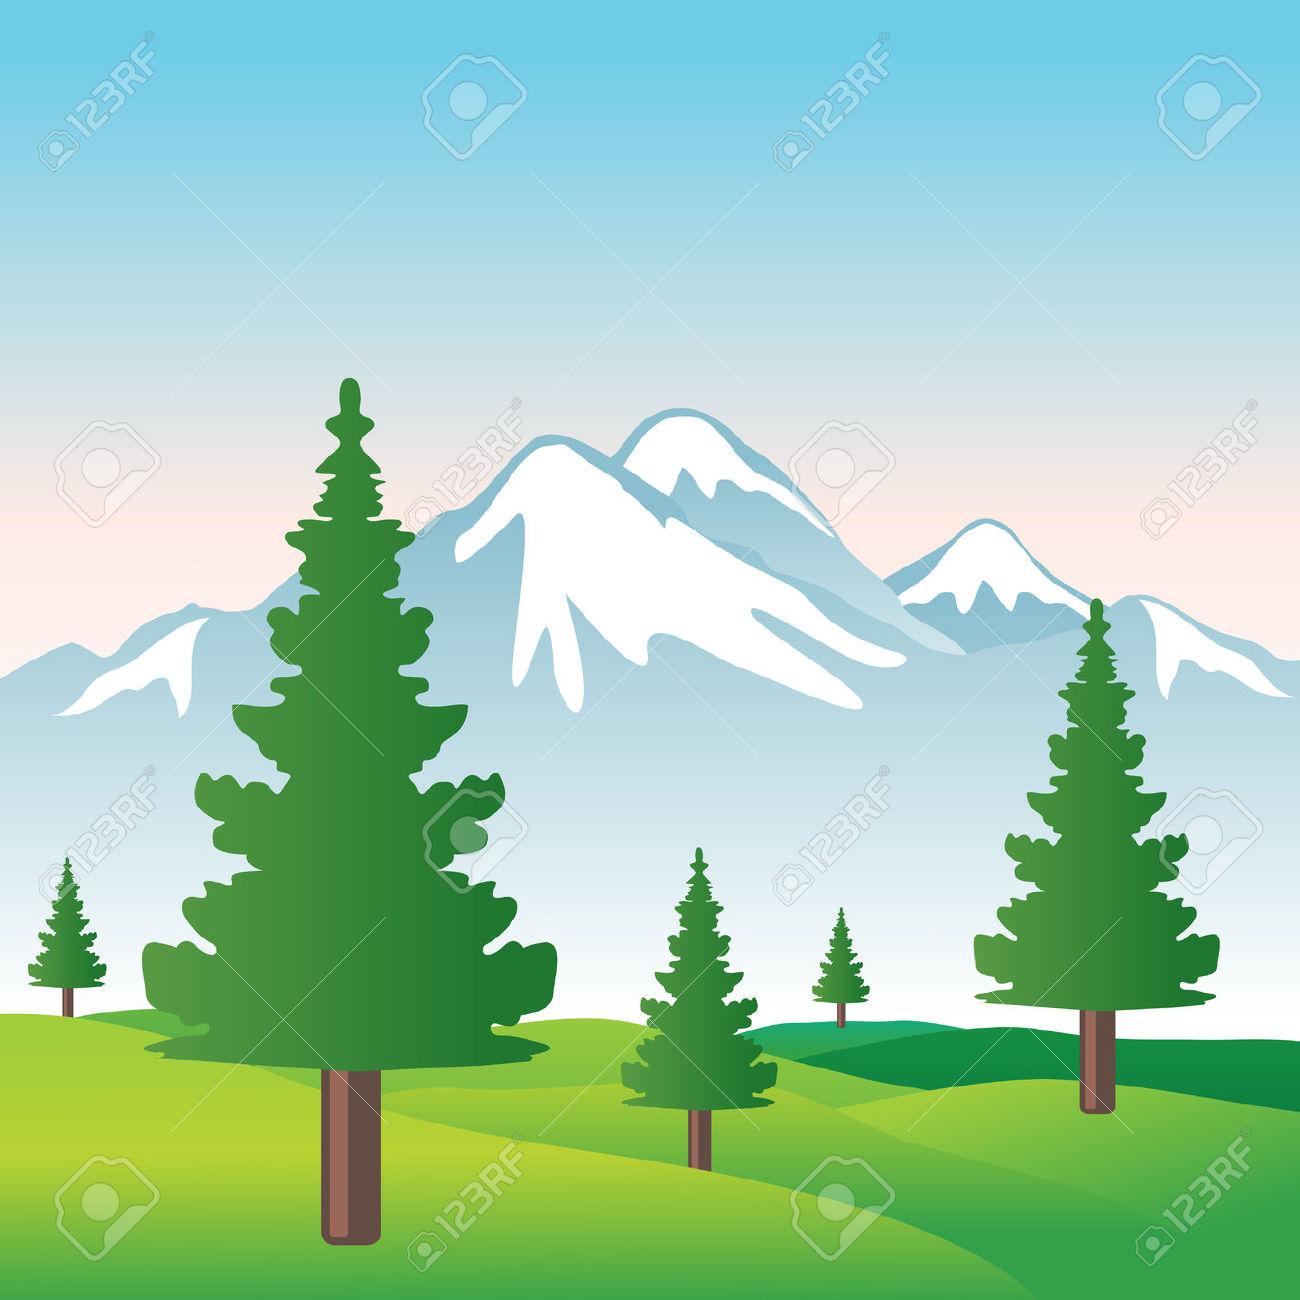 Tree mountain clipart.